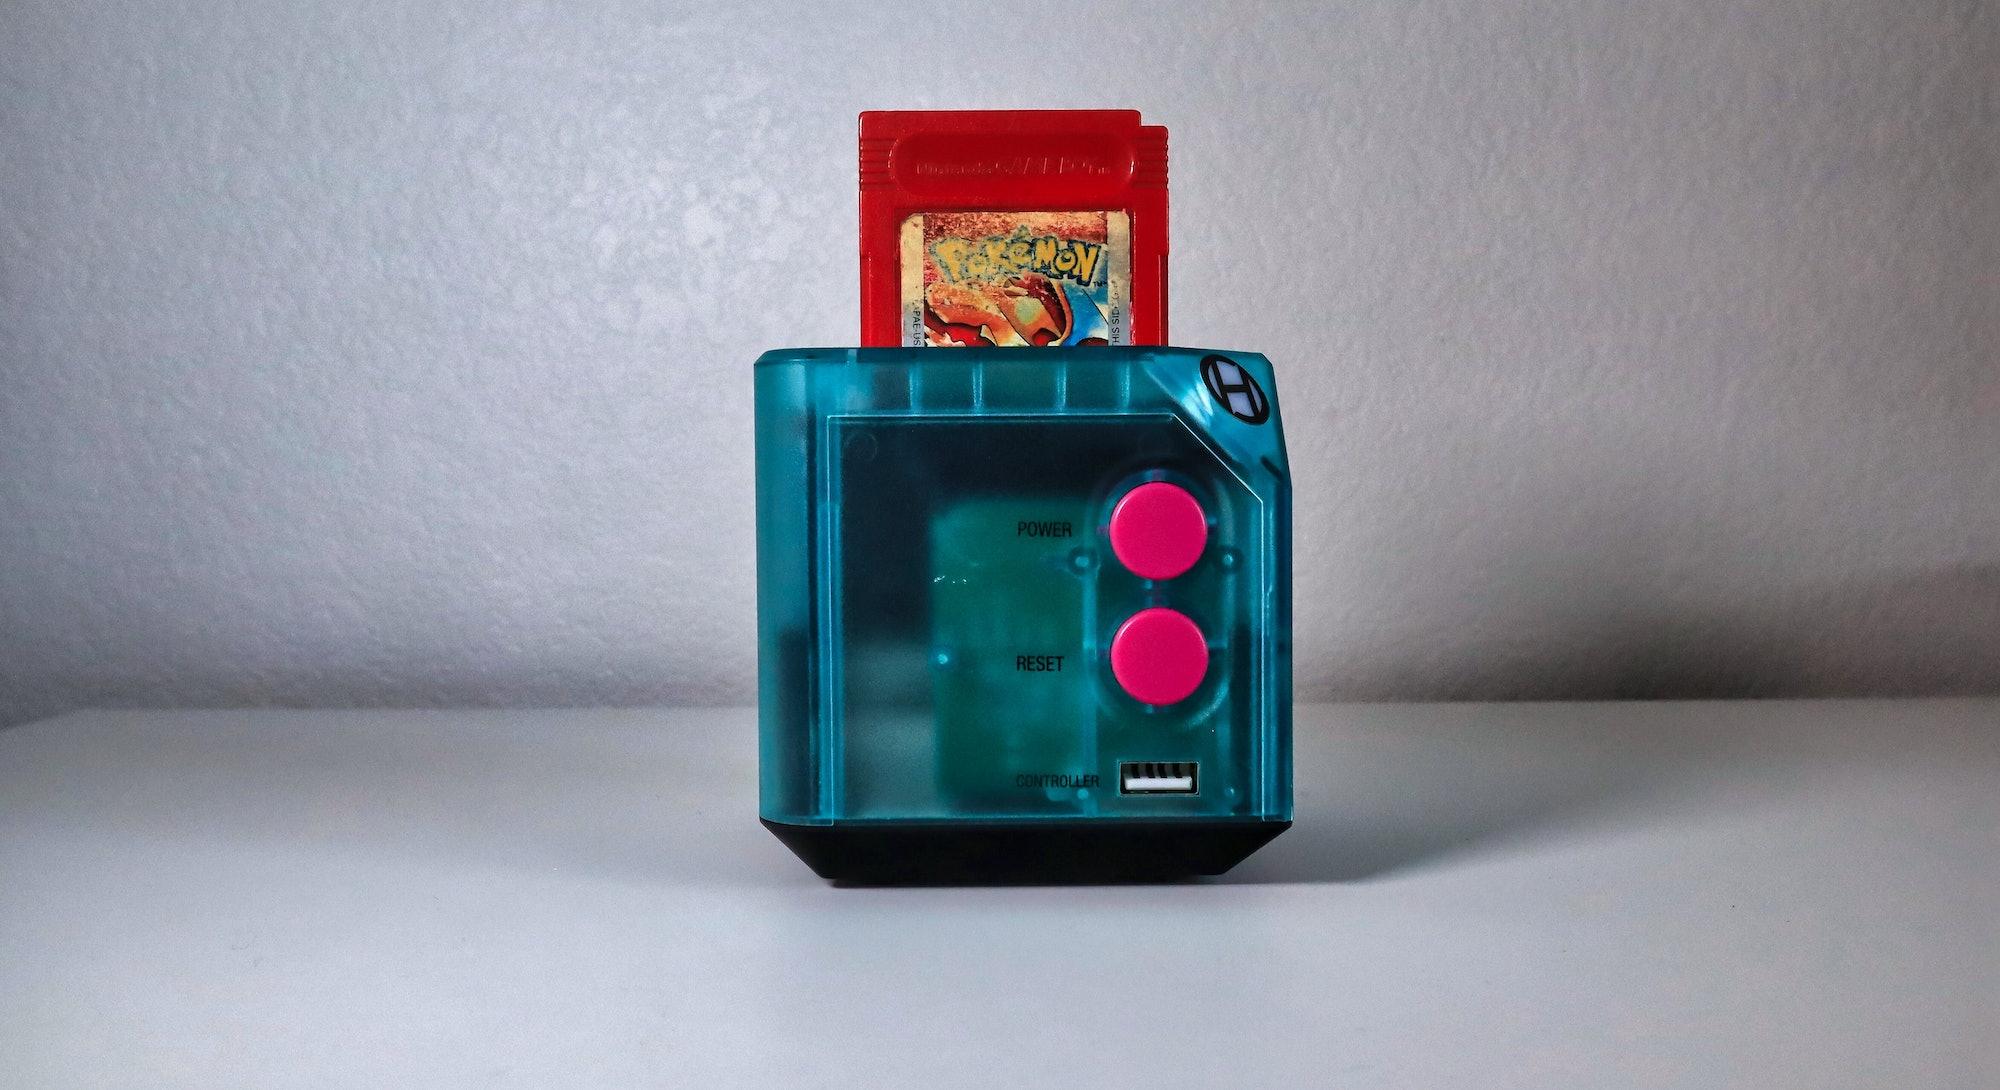 Hyperkin RetroN Sq review: Game Boy. Game Boy Color. Game Boy Advance games on TV. Gaming. Games. Vi...